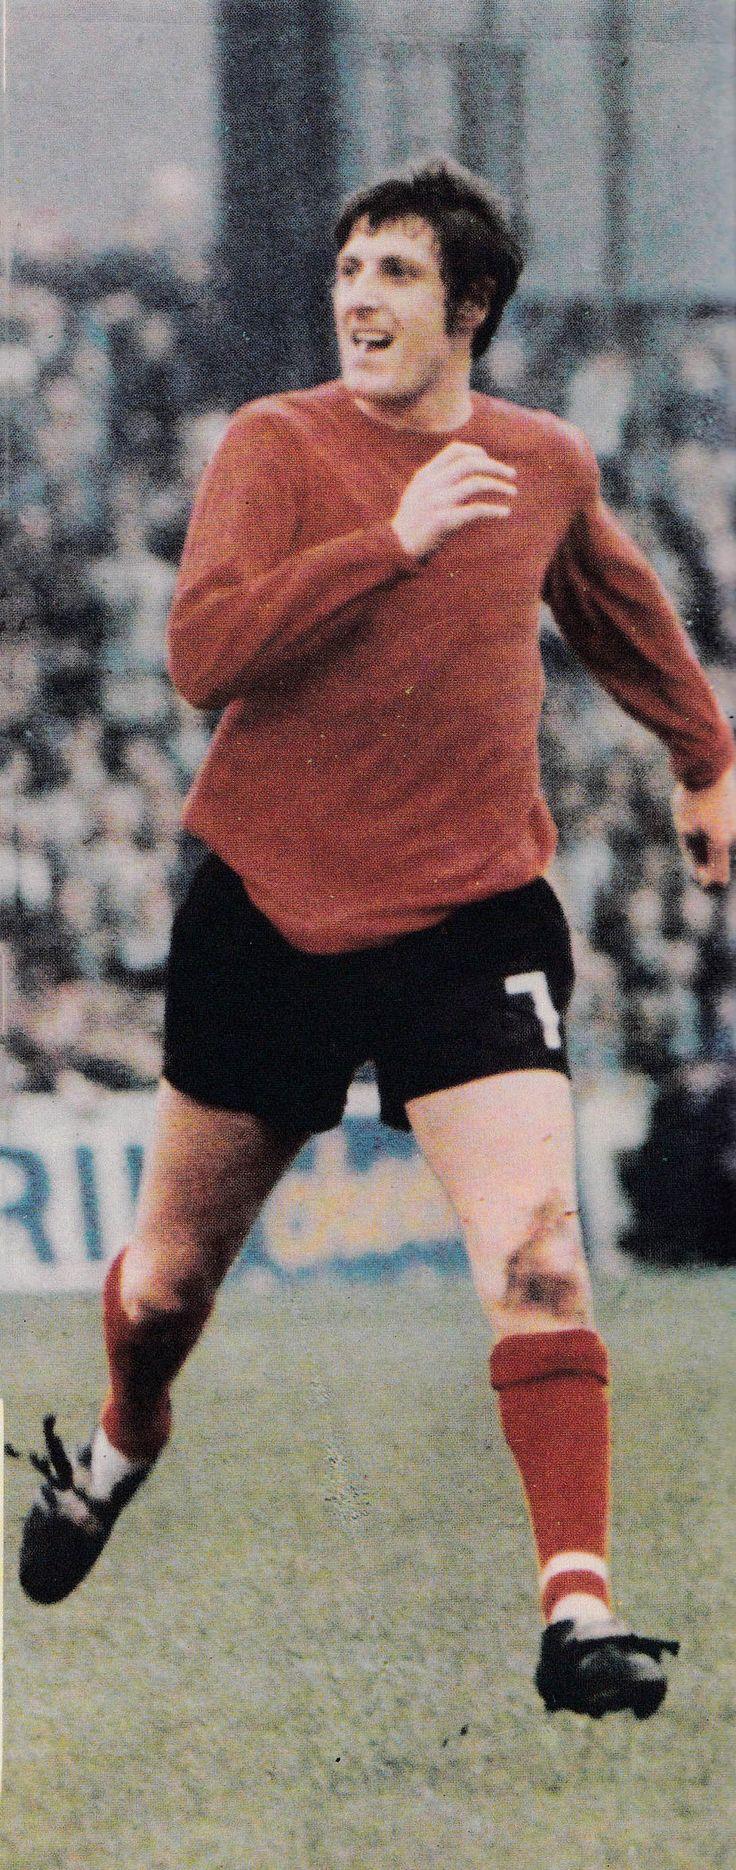 Circa 1969/70. West Bromwich Albion goal scoring midfield man Tony Brown wearing the Baggies change kit.